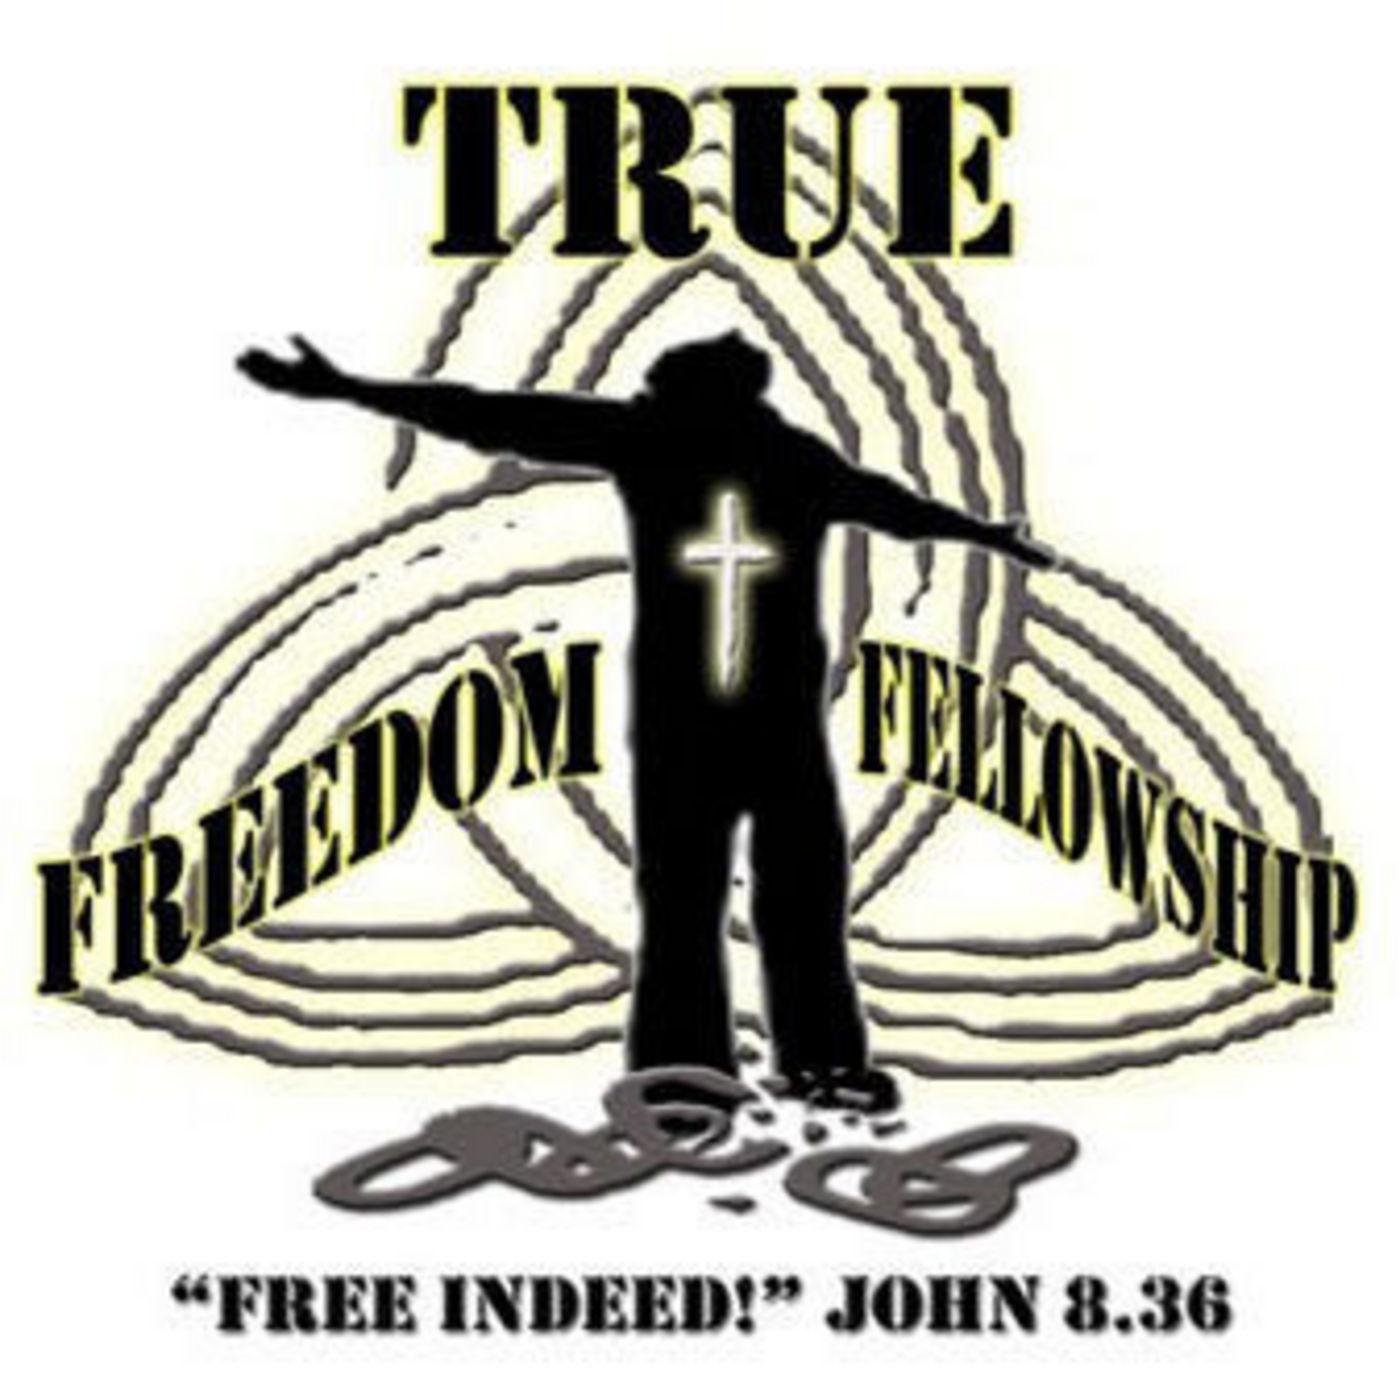 <![CDATA[True Freedom Fellowship]]>